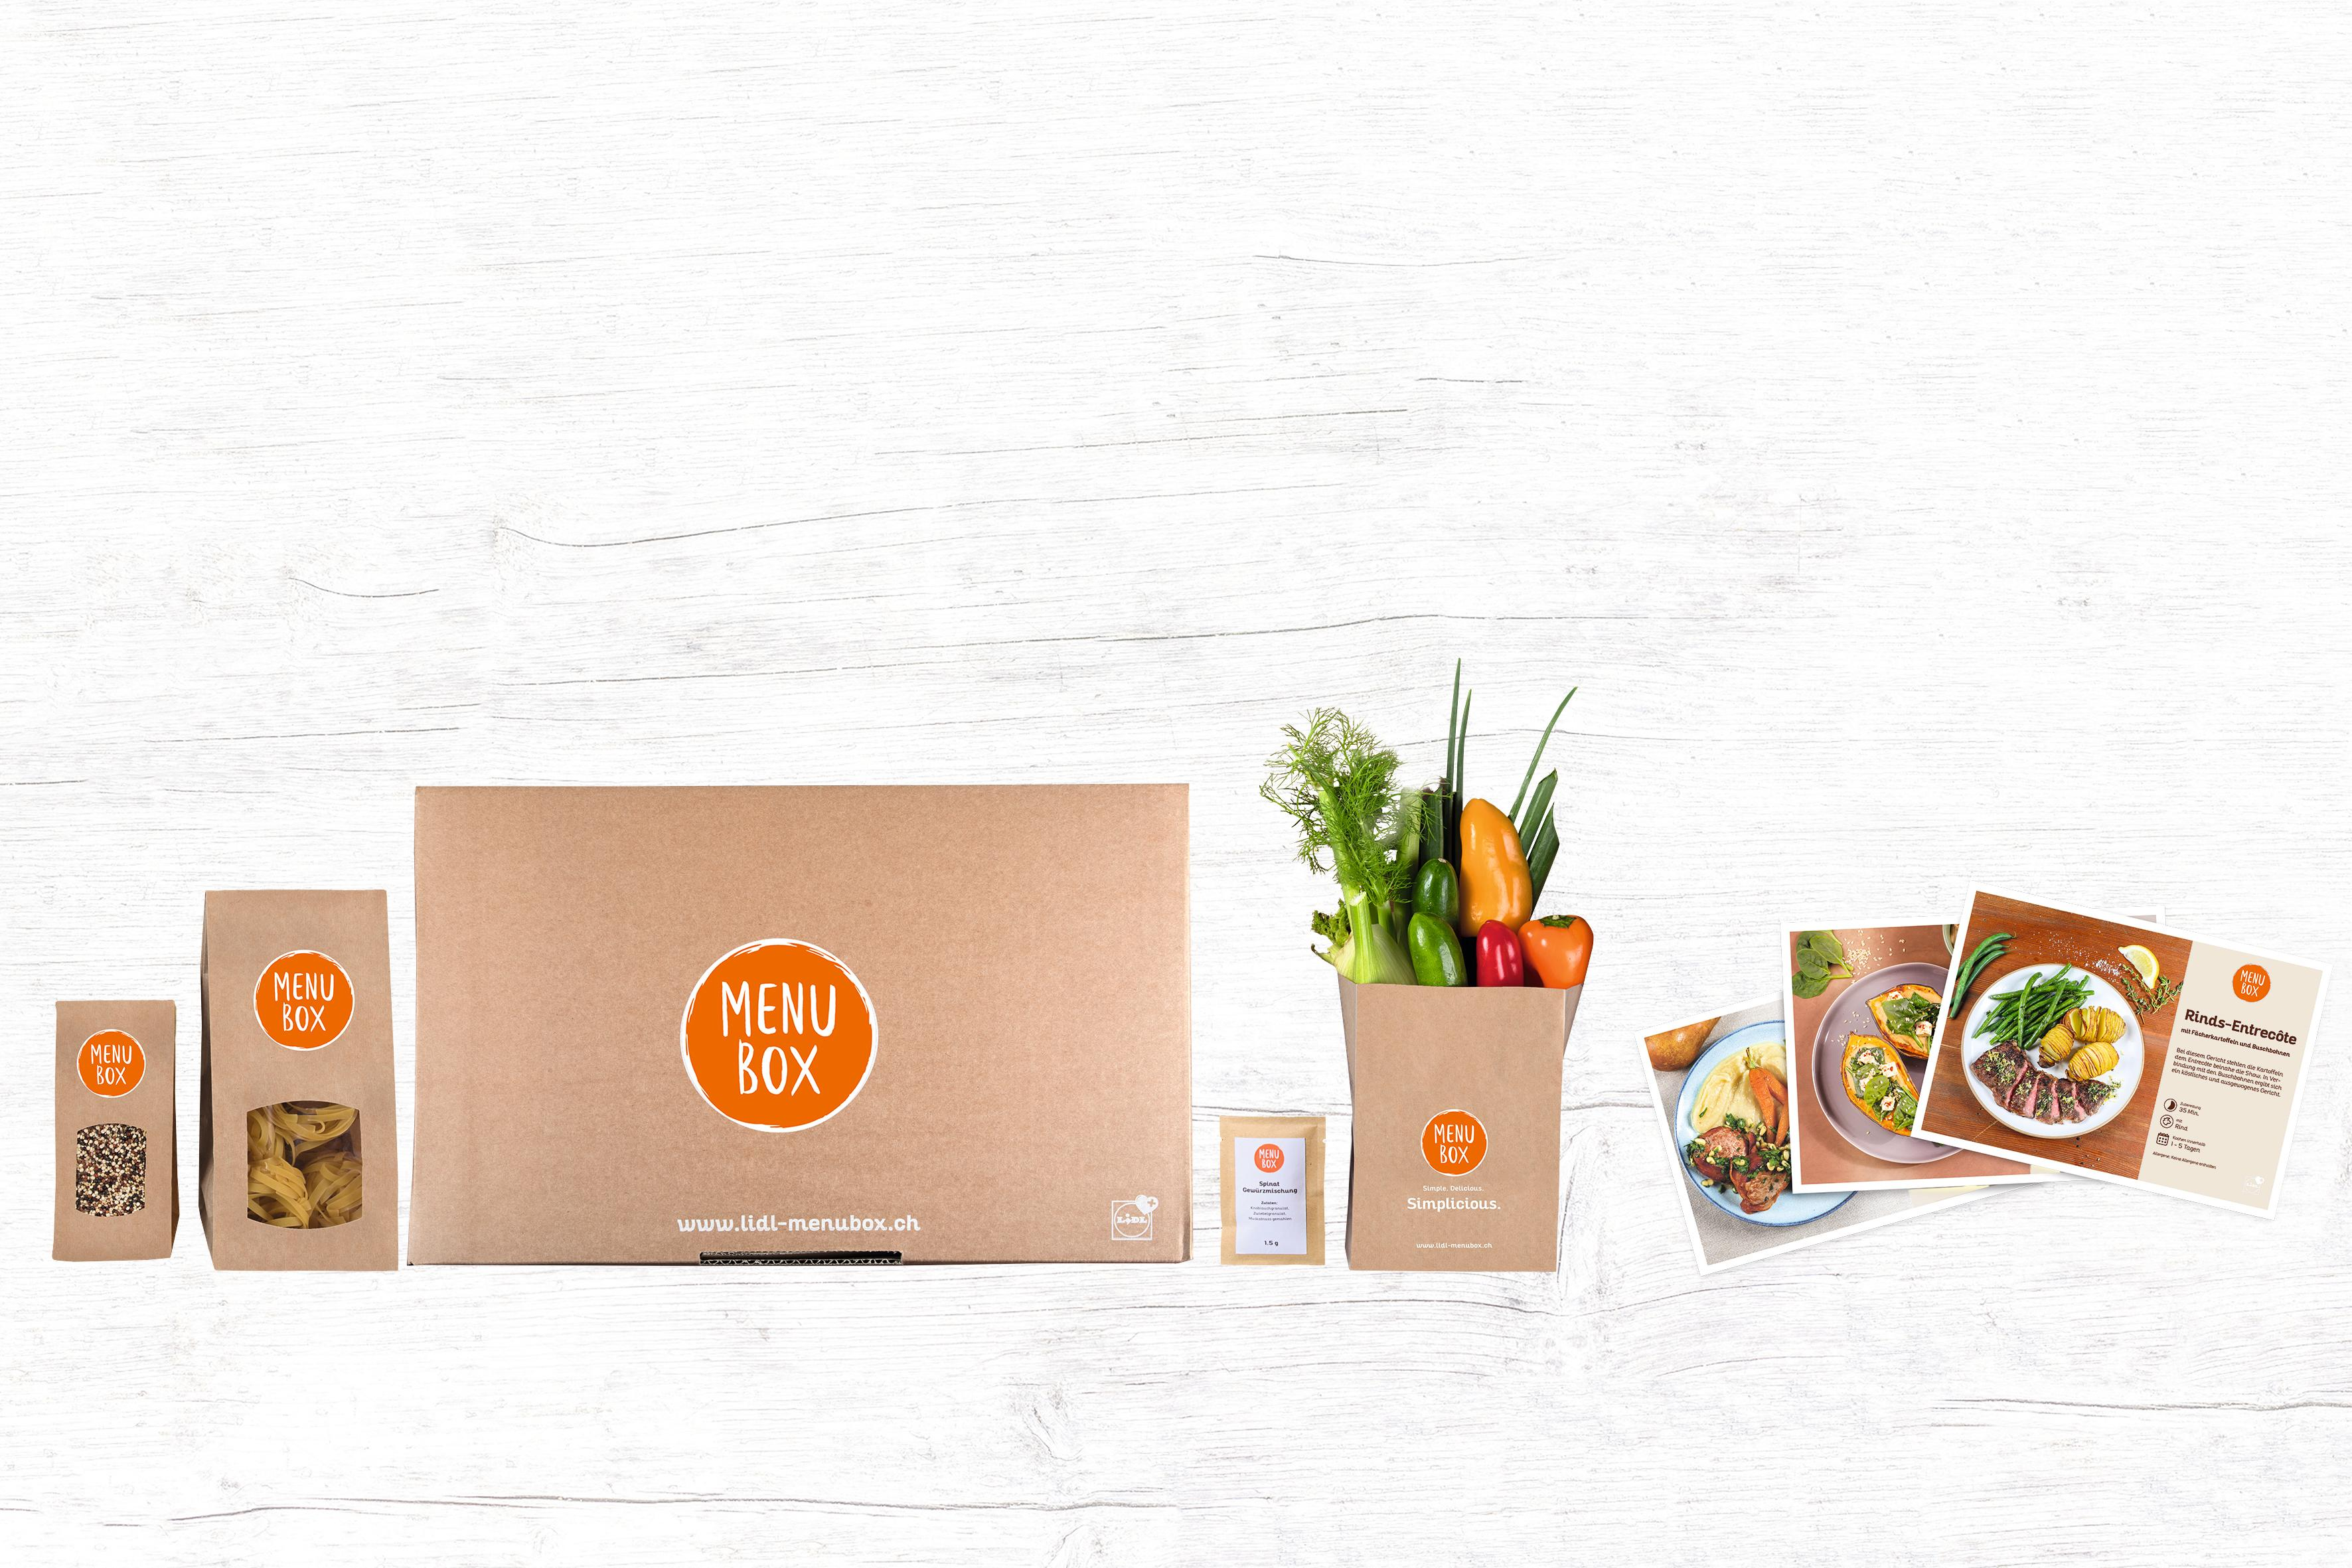 lidl schweiz lanciert kochboxen zum online bestellen medienmitteilung lidl schweiz. Black Bedroom Furniture Sets. Home Design Ideas